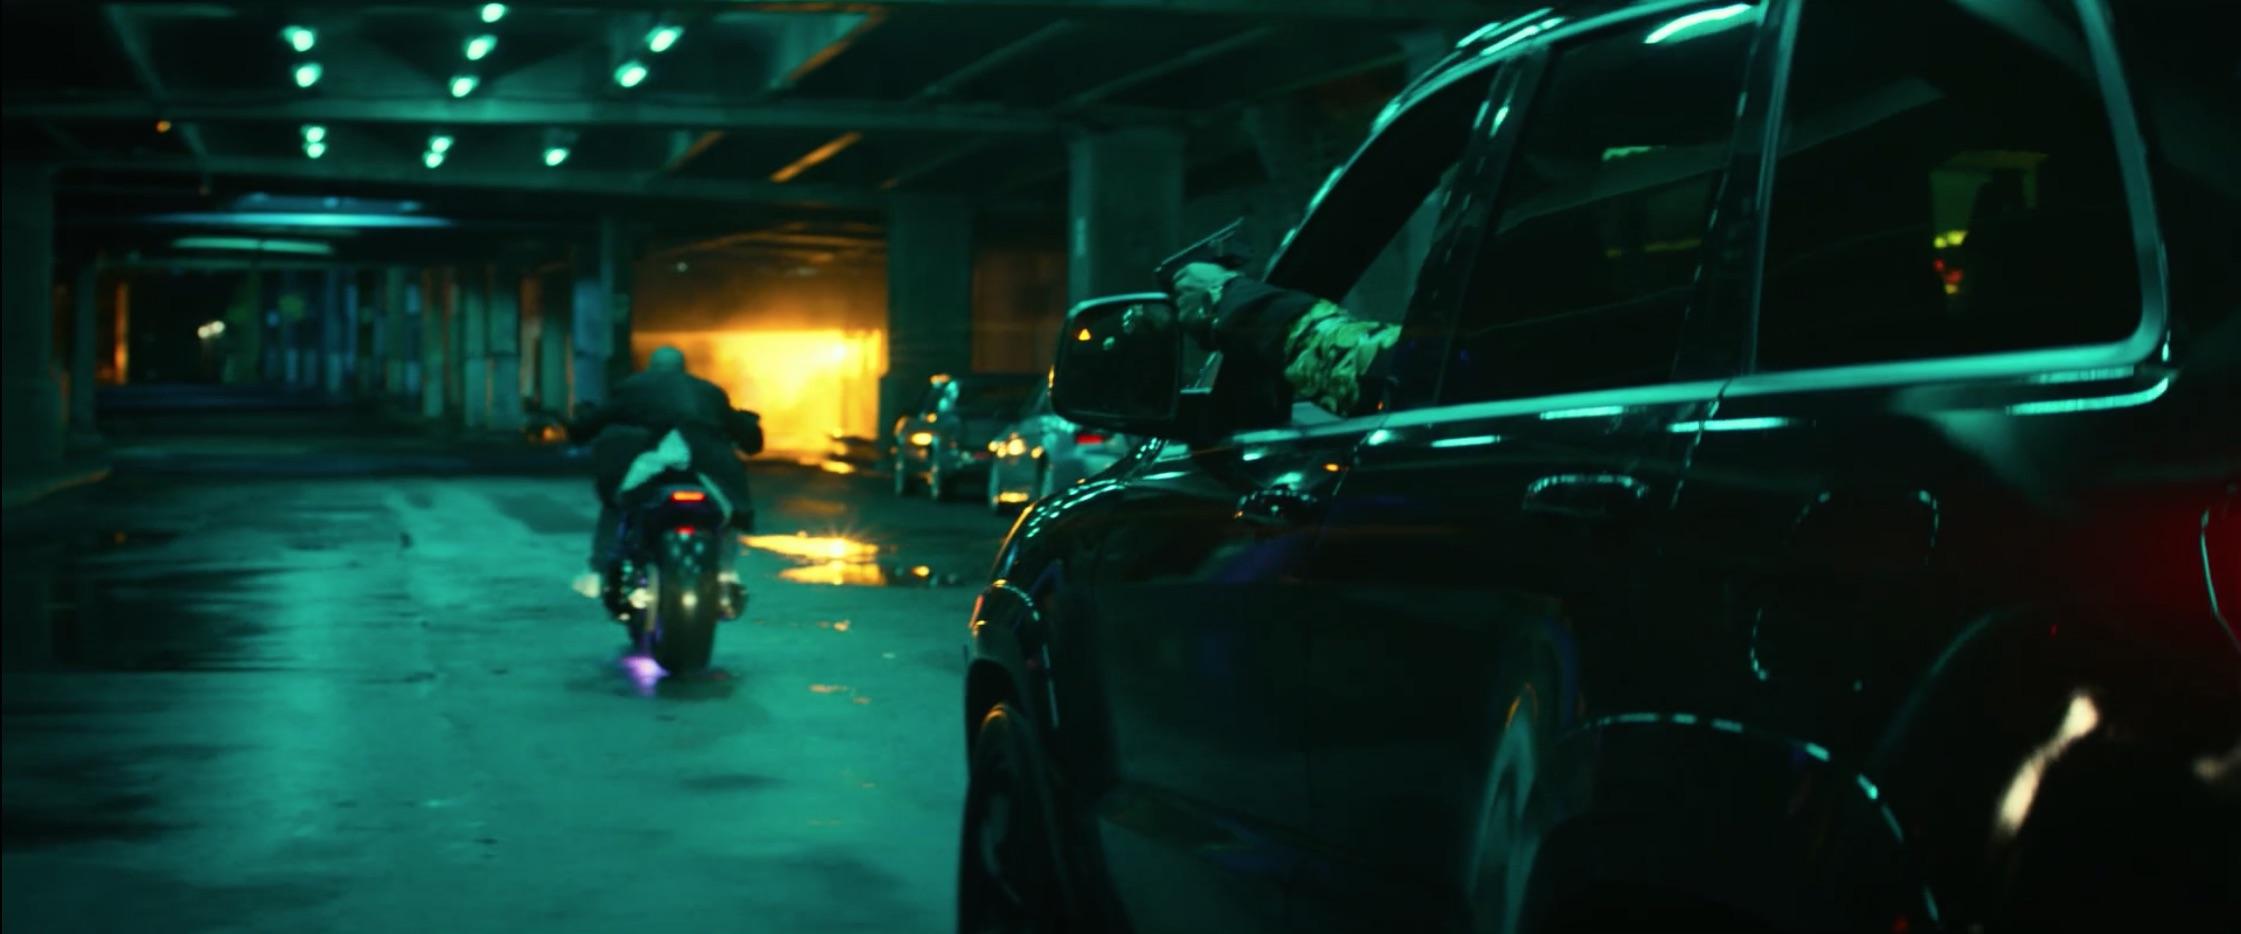 Bad Boys For Life suv uzi chasing motorcycle rider